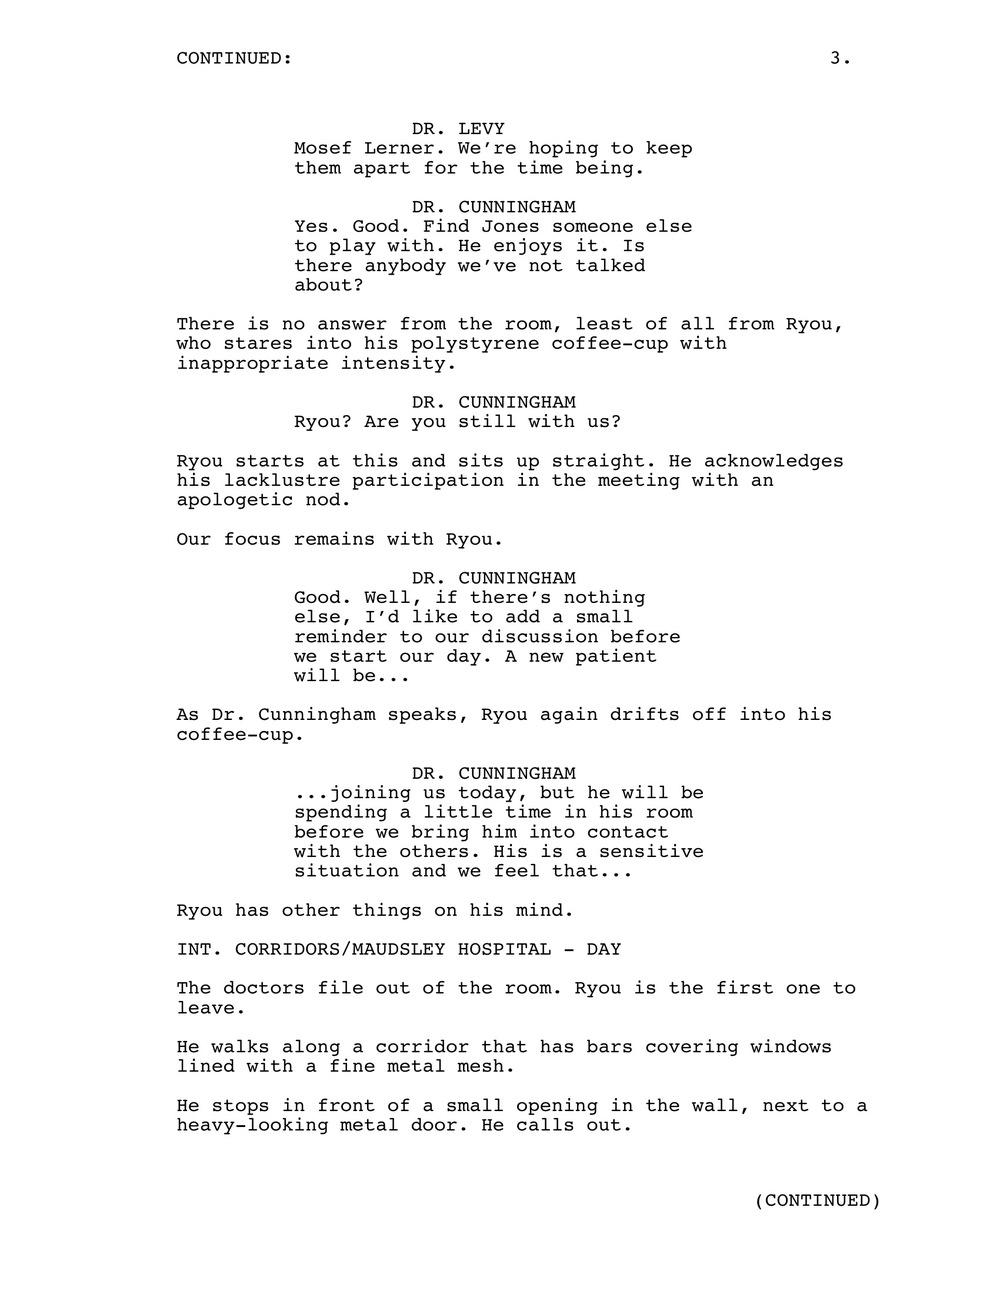 'Introducing Henry Charles' (Pilot) by Alexander Craig | 3.jpeg